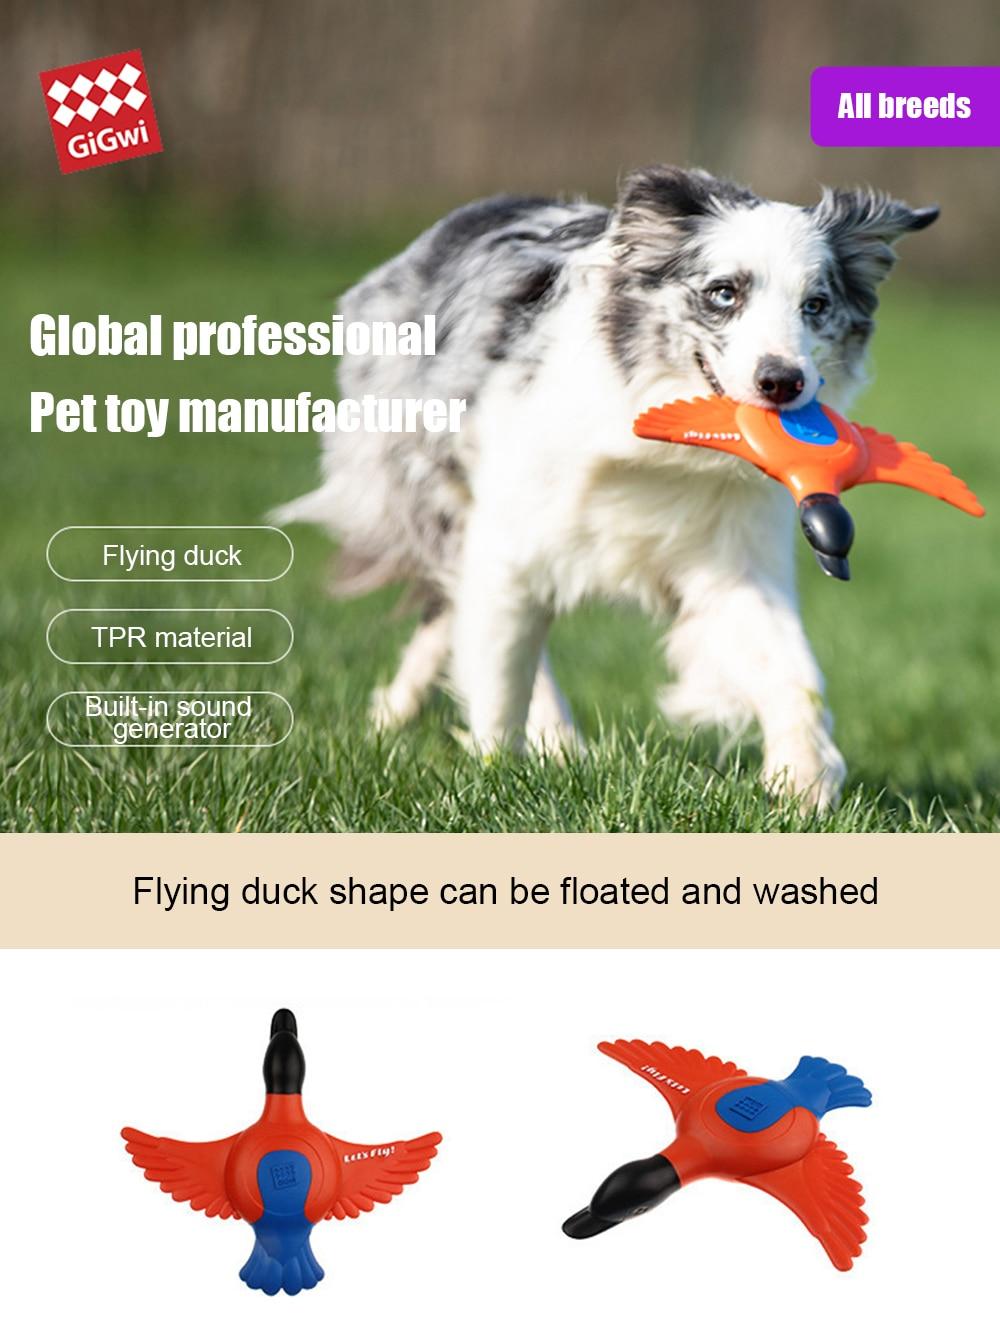 Juguetes Para Mascotas GIGWI, discos voladores de la serie Tug, discos voladores de pato, juguete para entrenamiento de perros, material TPR, juguete interactivo no tóxico para cachorros